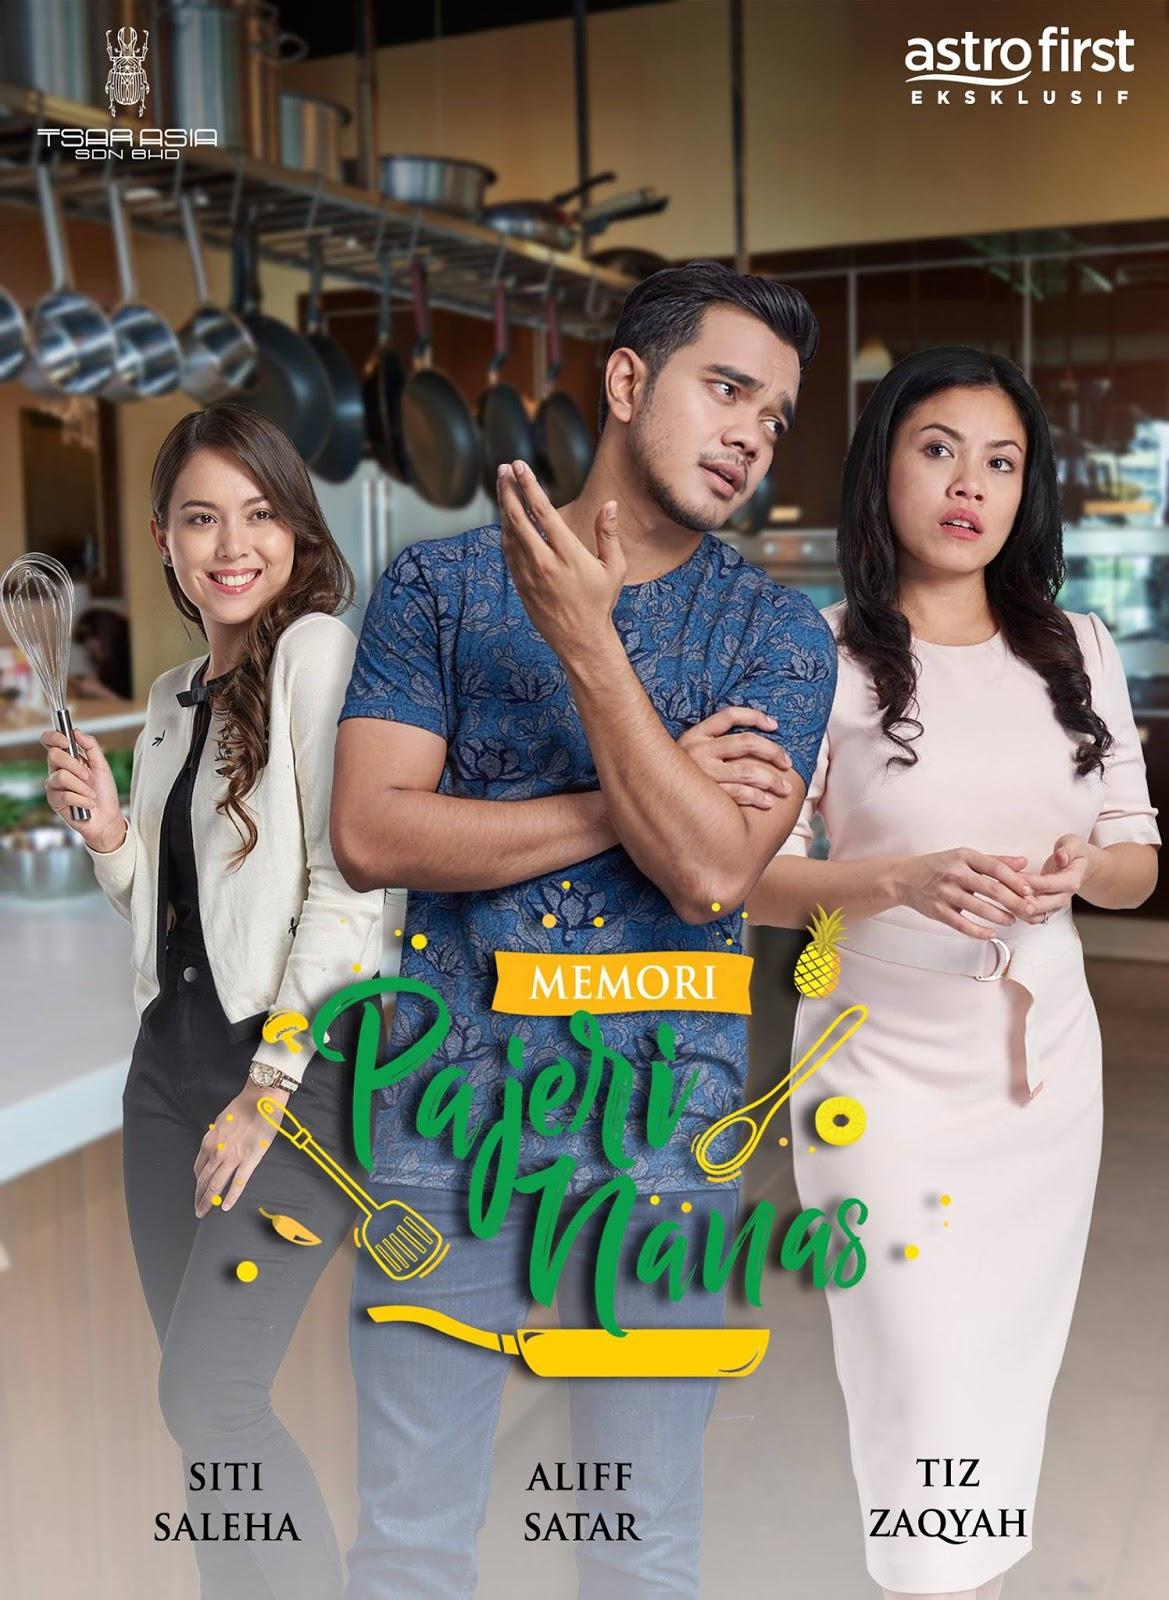 Memori Pajeri Nanas